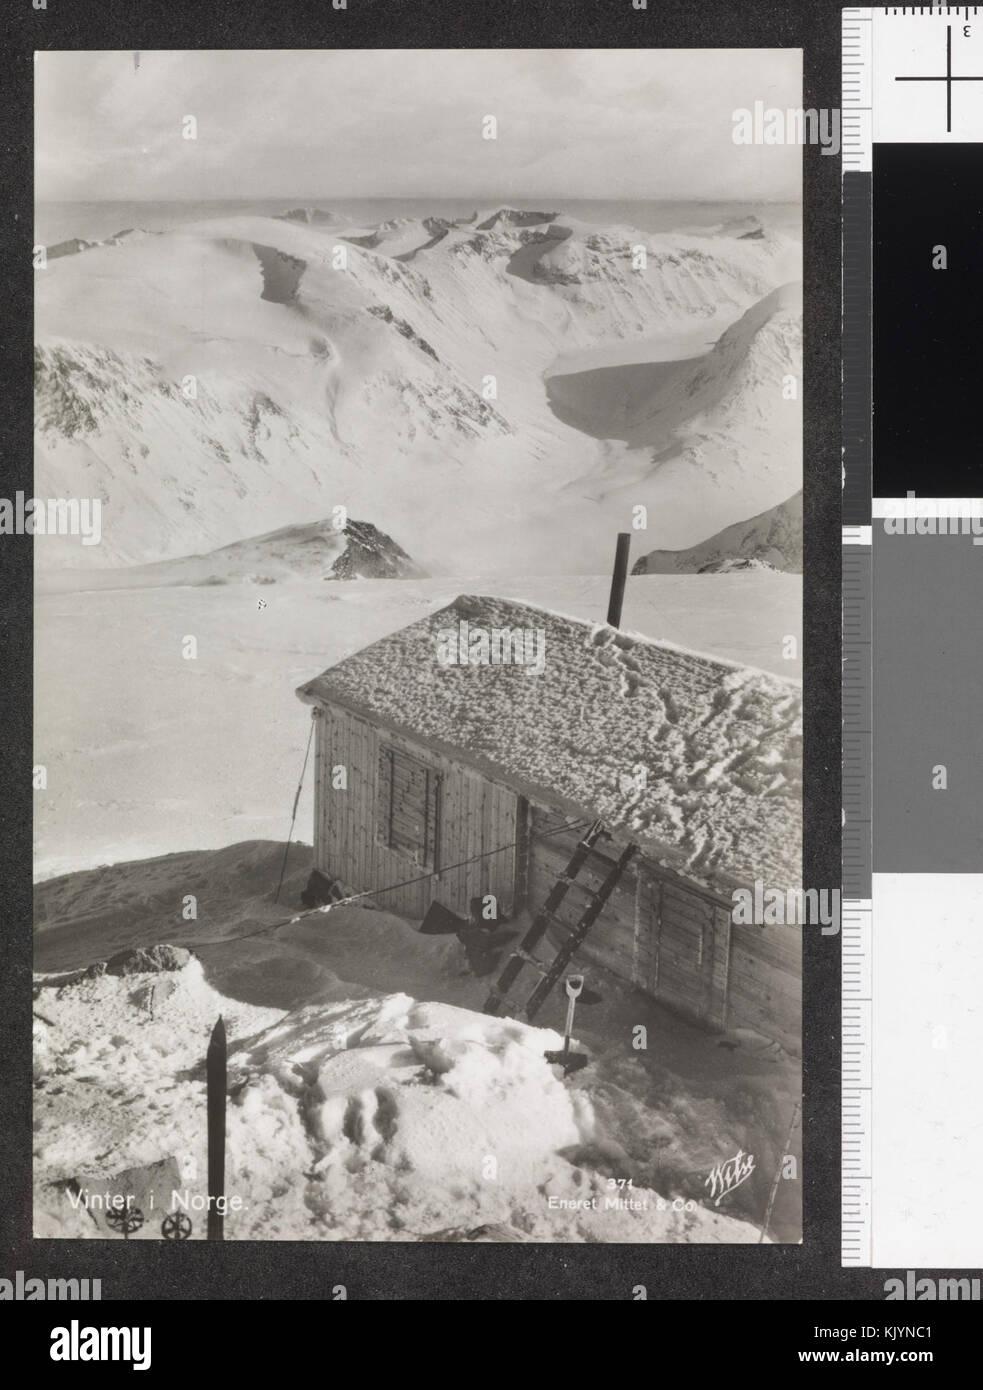 371. Vinter i Norge   no nb digifoto 20150126 00006 blds 07168 - Stock Image